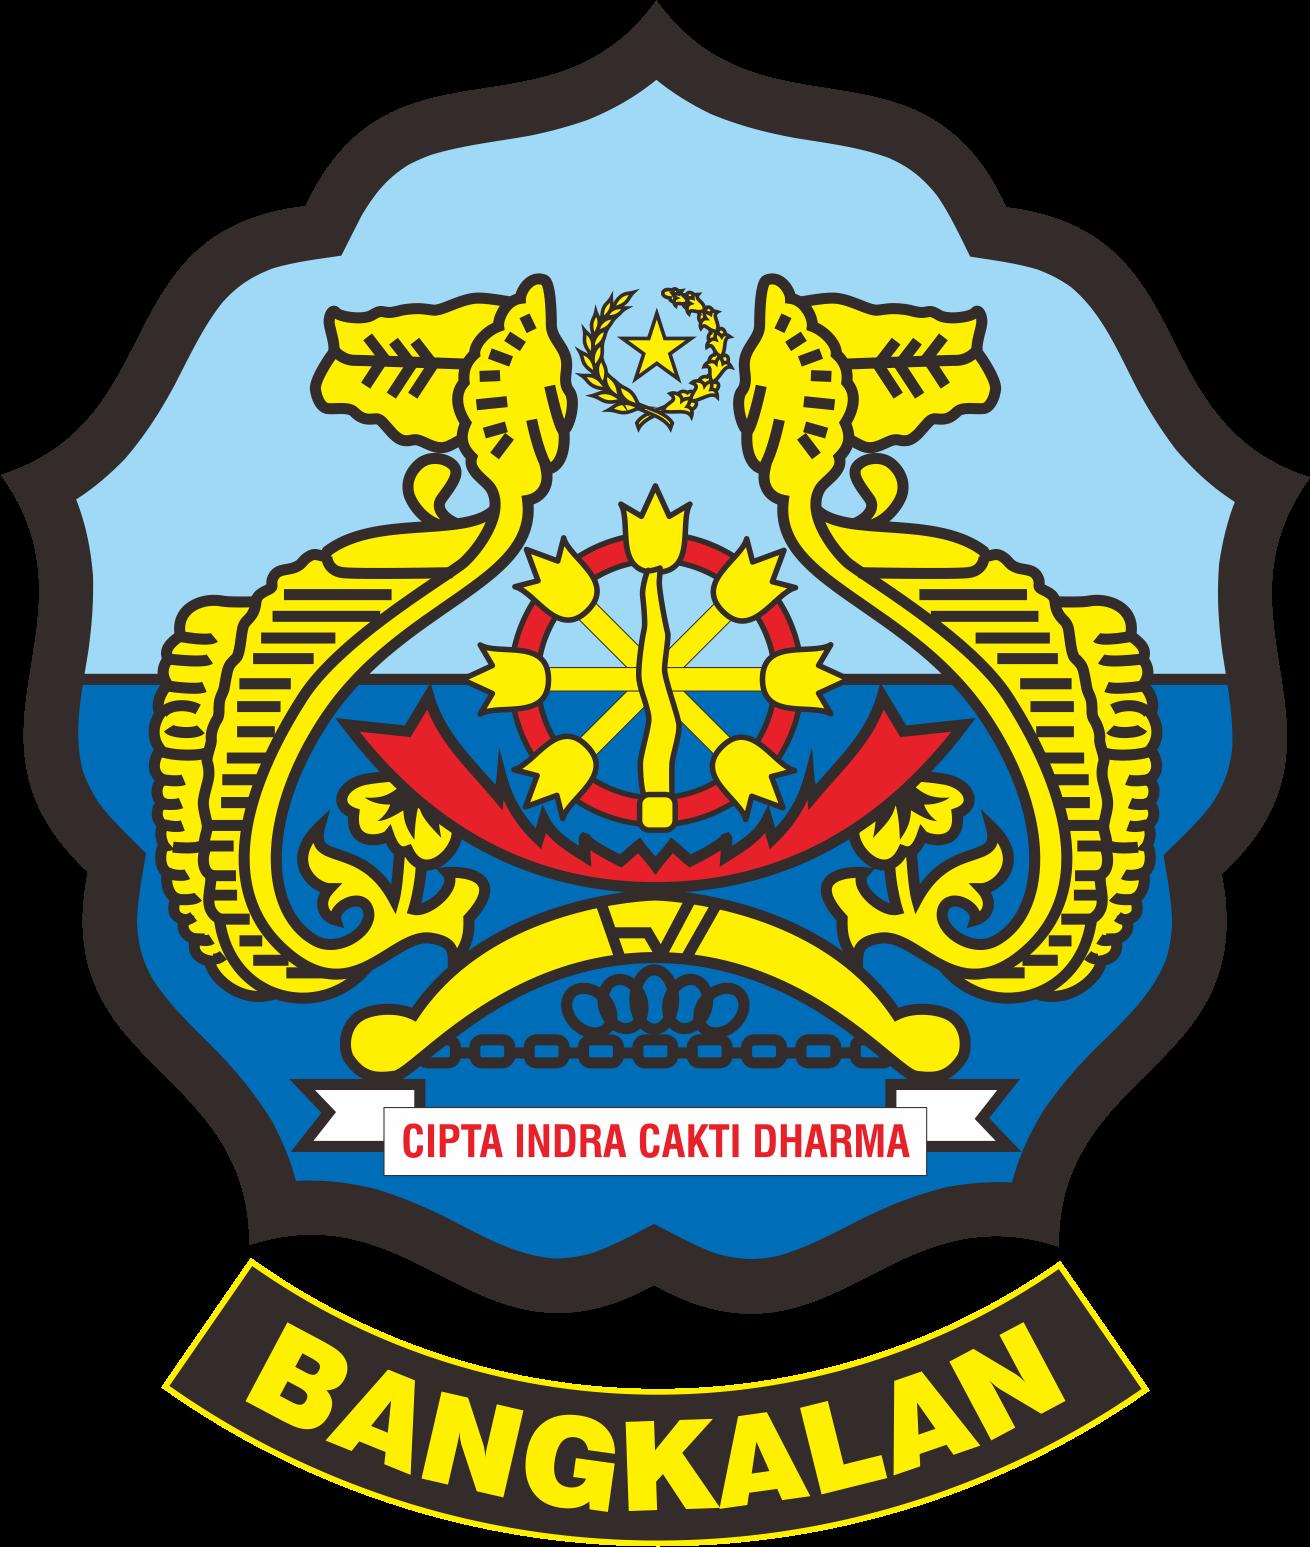 Pengumuman Kelulusan Dan Hasil Tkd Cpns Kabupaten Bangkalan 2014